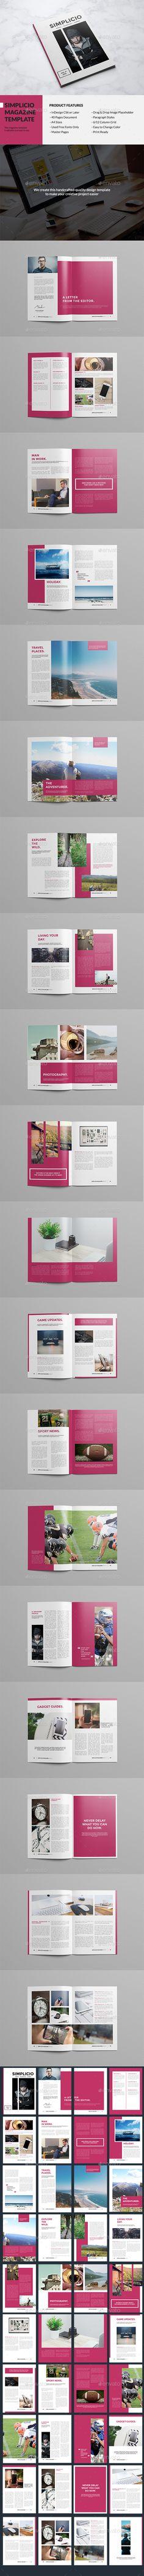 Simplio Magazine Template InDesign INDD #journal #design Download: http://graphicriver.net/item/simplio-magazine/13325421?ref=ksioks